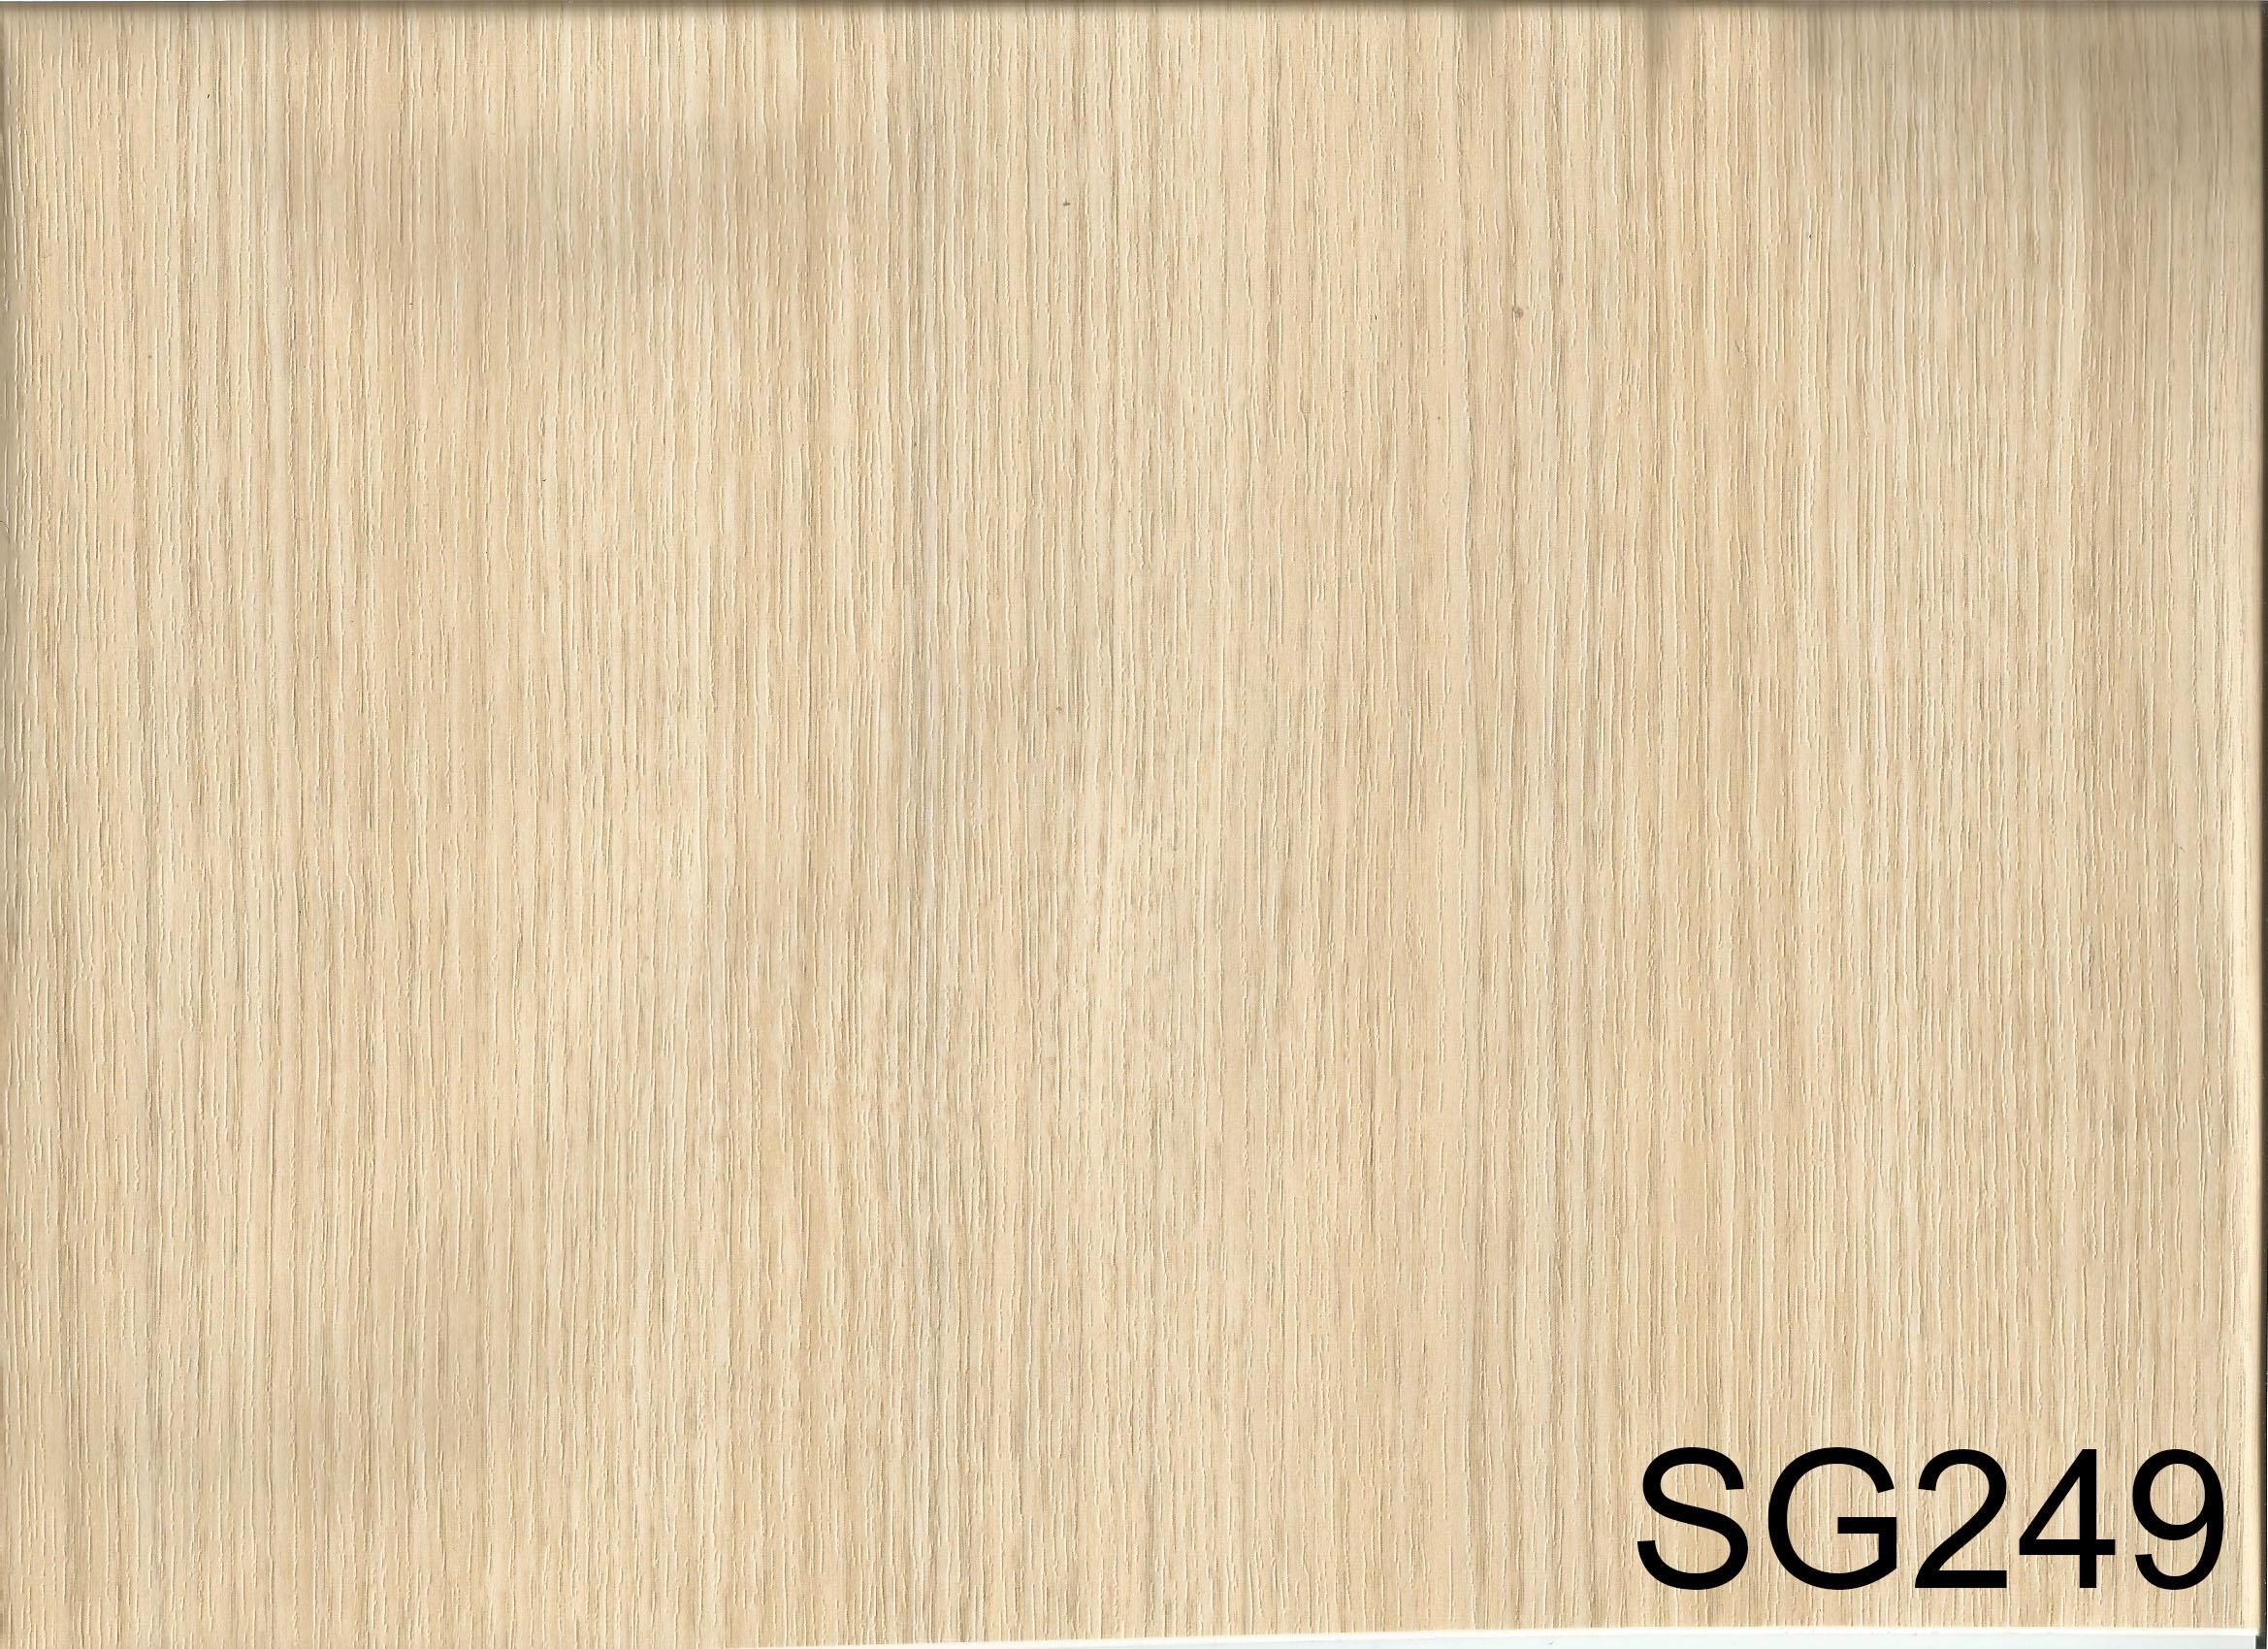 SG249